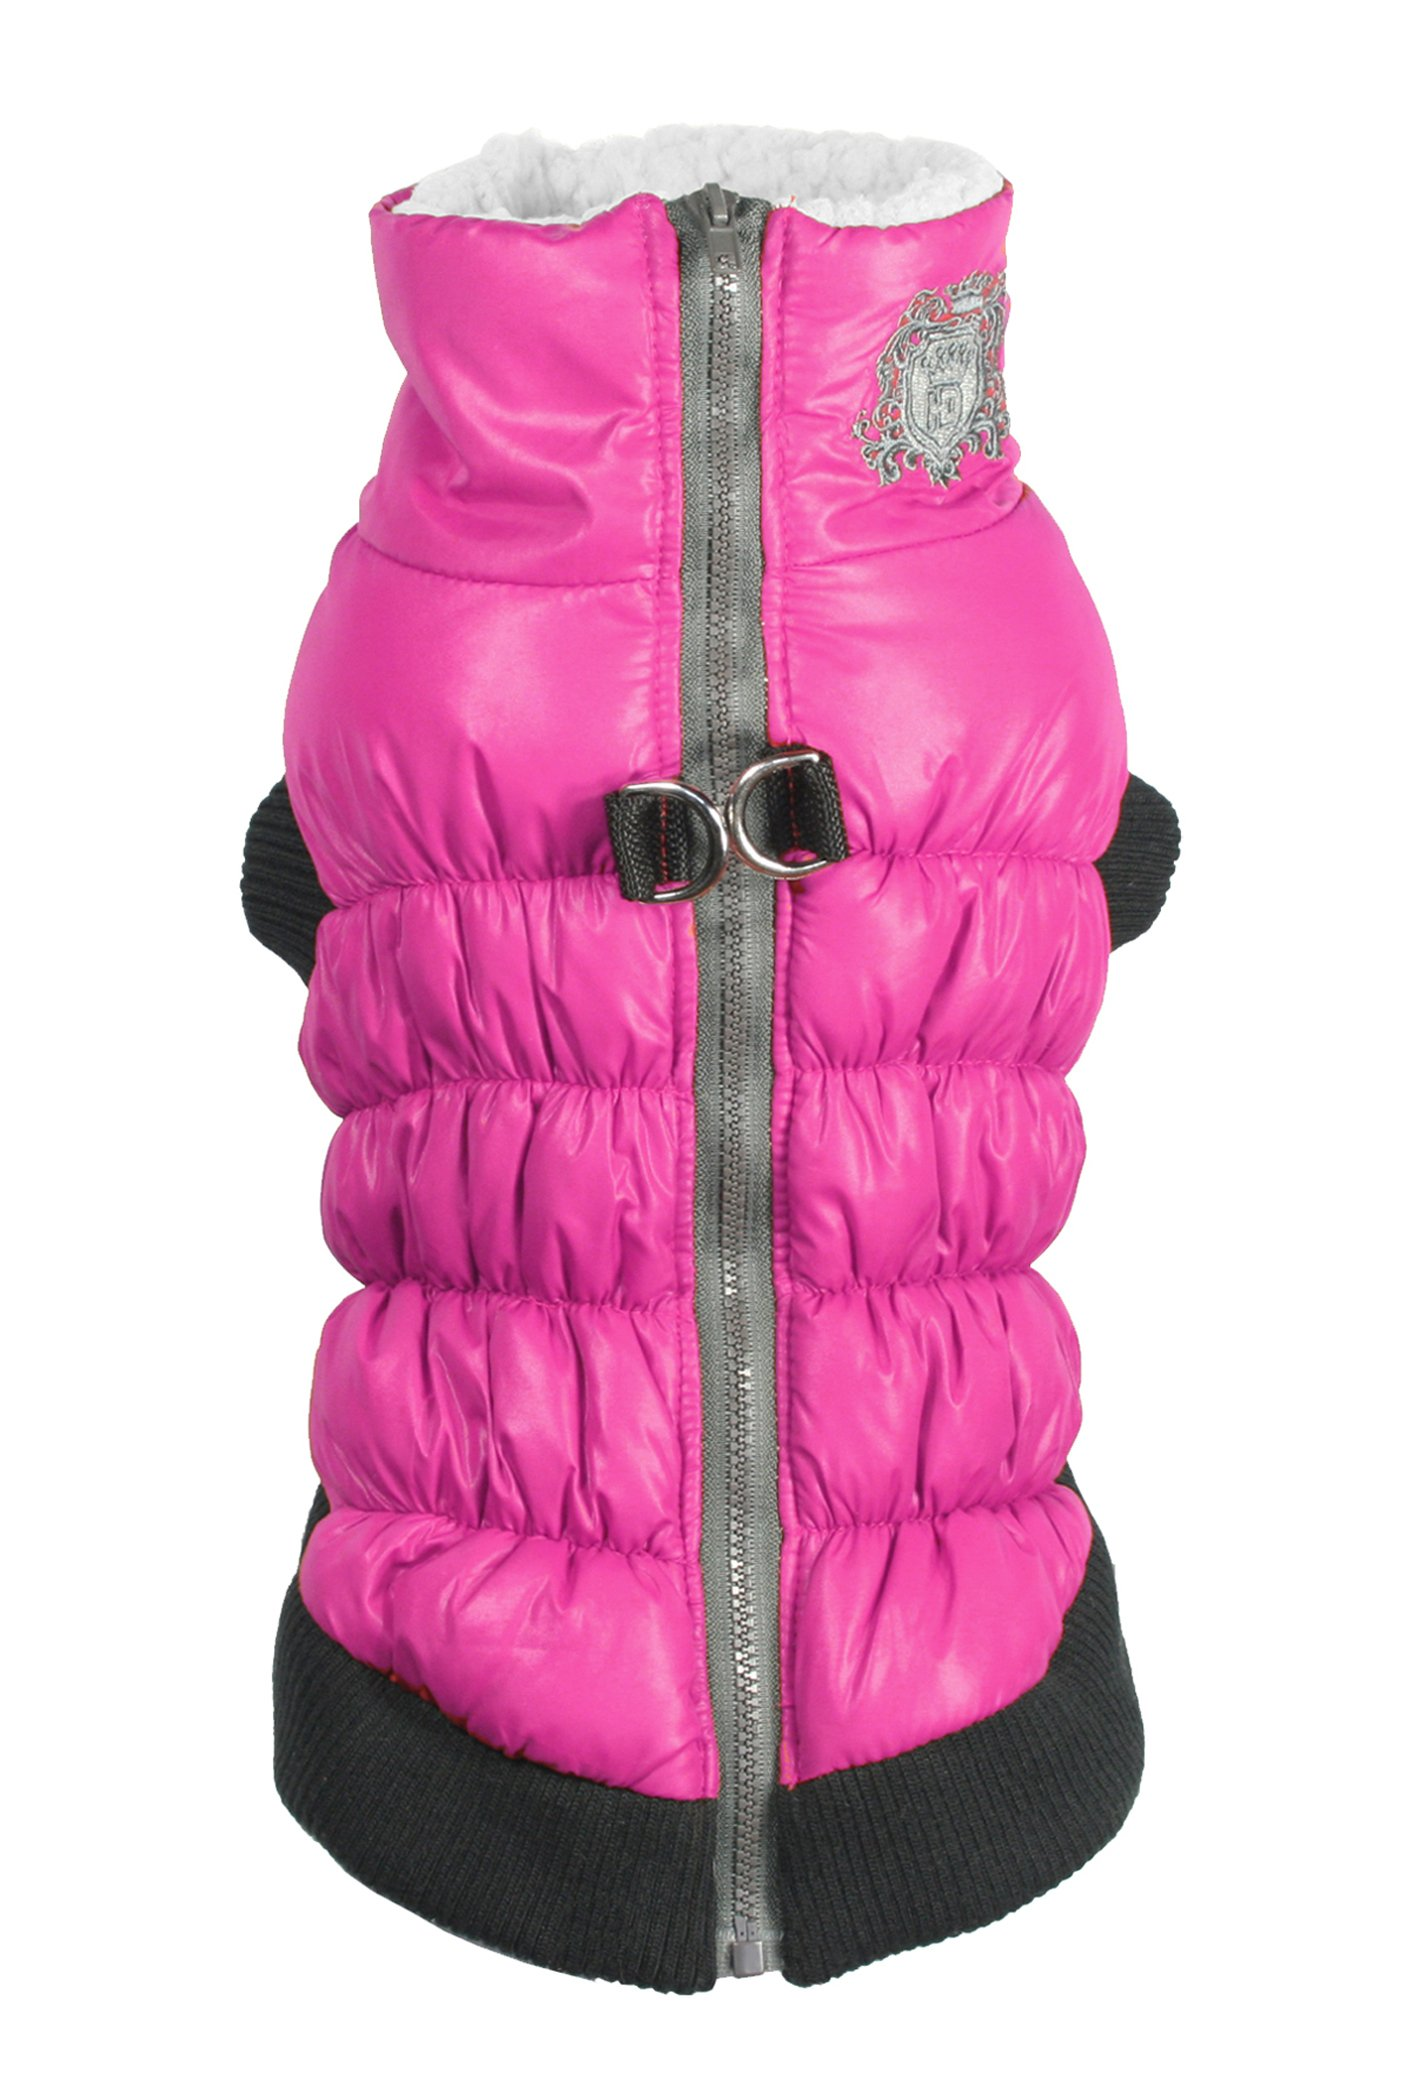 Hip Doggie Water Repellent Dog Coat - Winter Jacket with Fur Lining